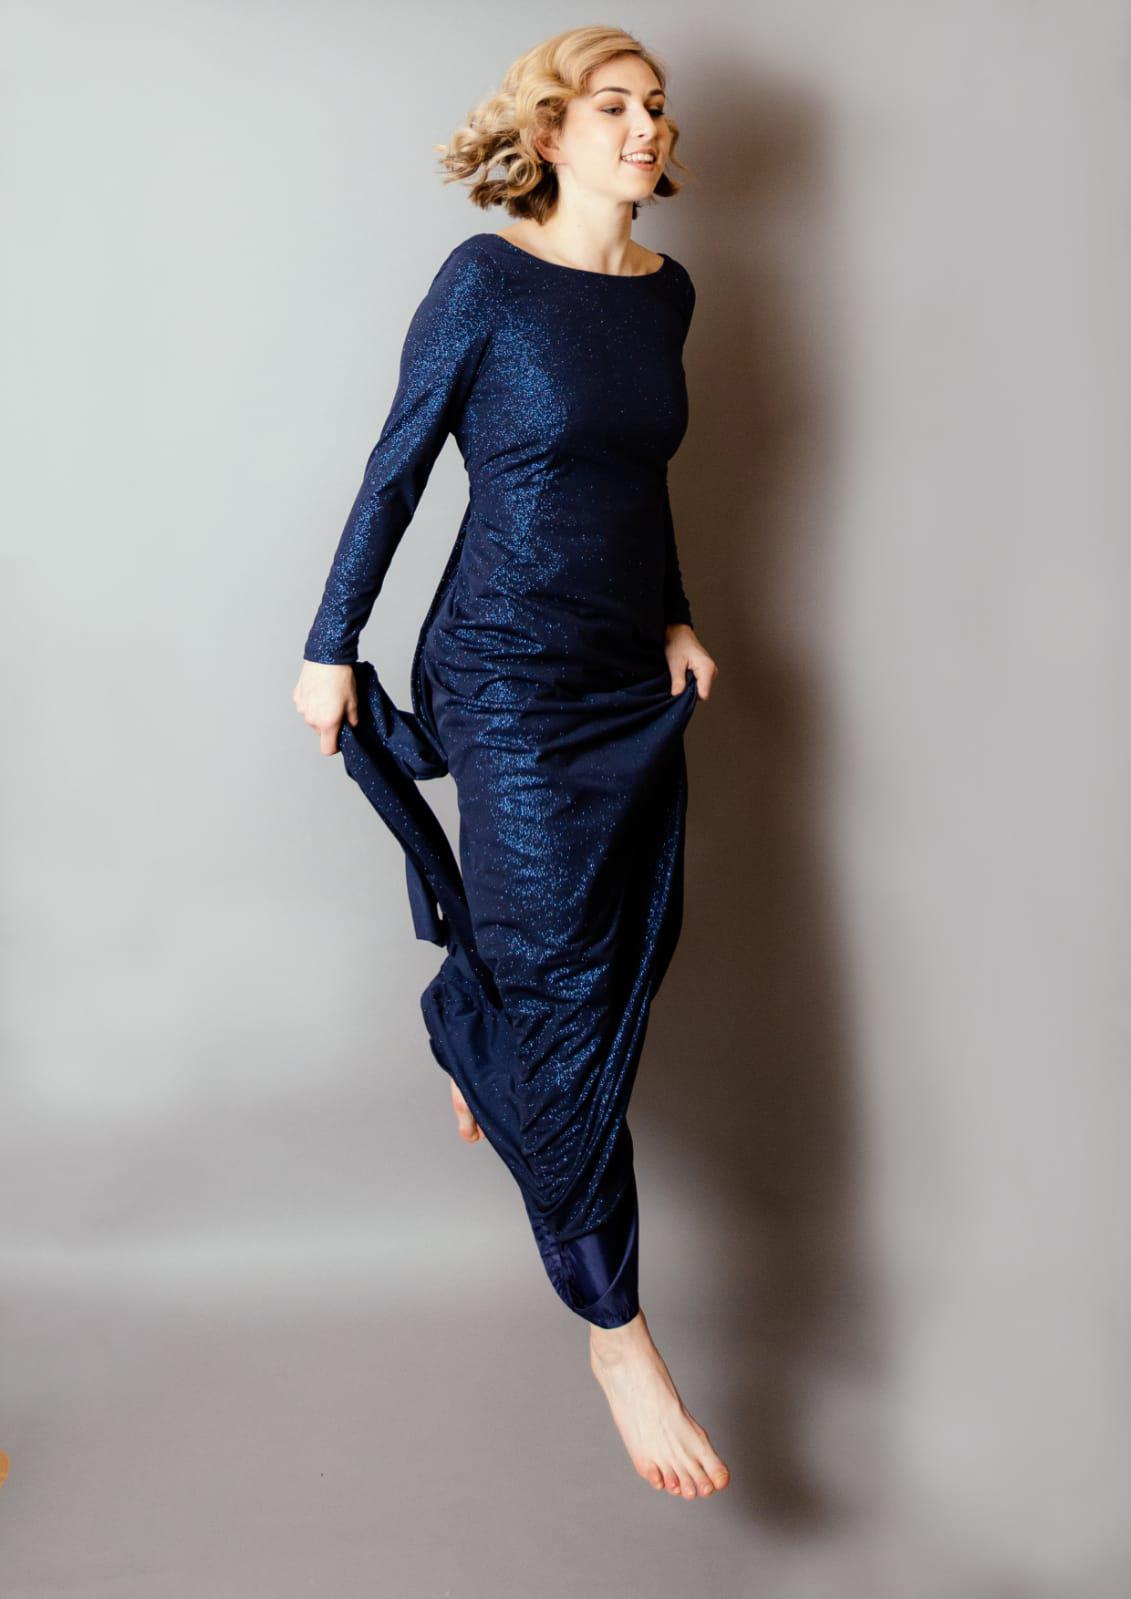 Fashion with a Chronic Illness | Zobi Fashion Design Consultancy